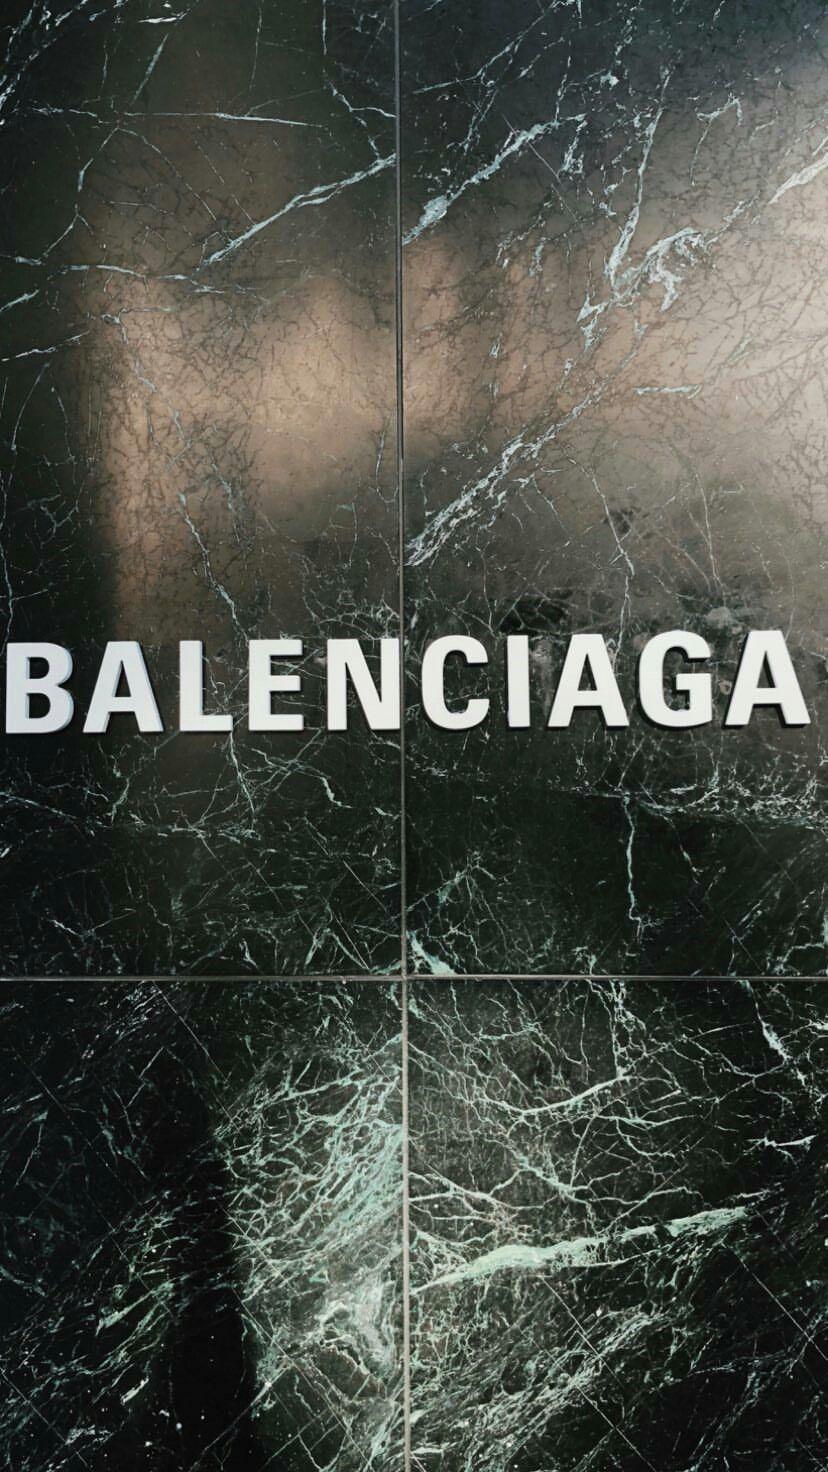 Balenciaga Luxury Luxurylife Wallpaper Fond D Ecran Telephone Fond D Ecran Colore Fond D Ecran Iphone Pastel